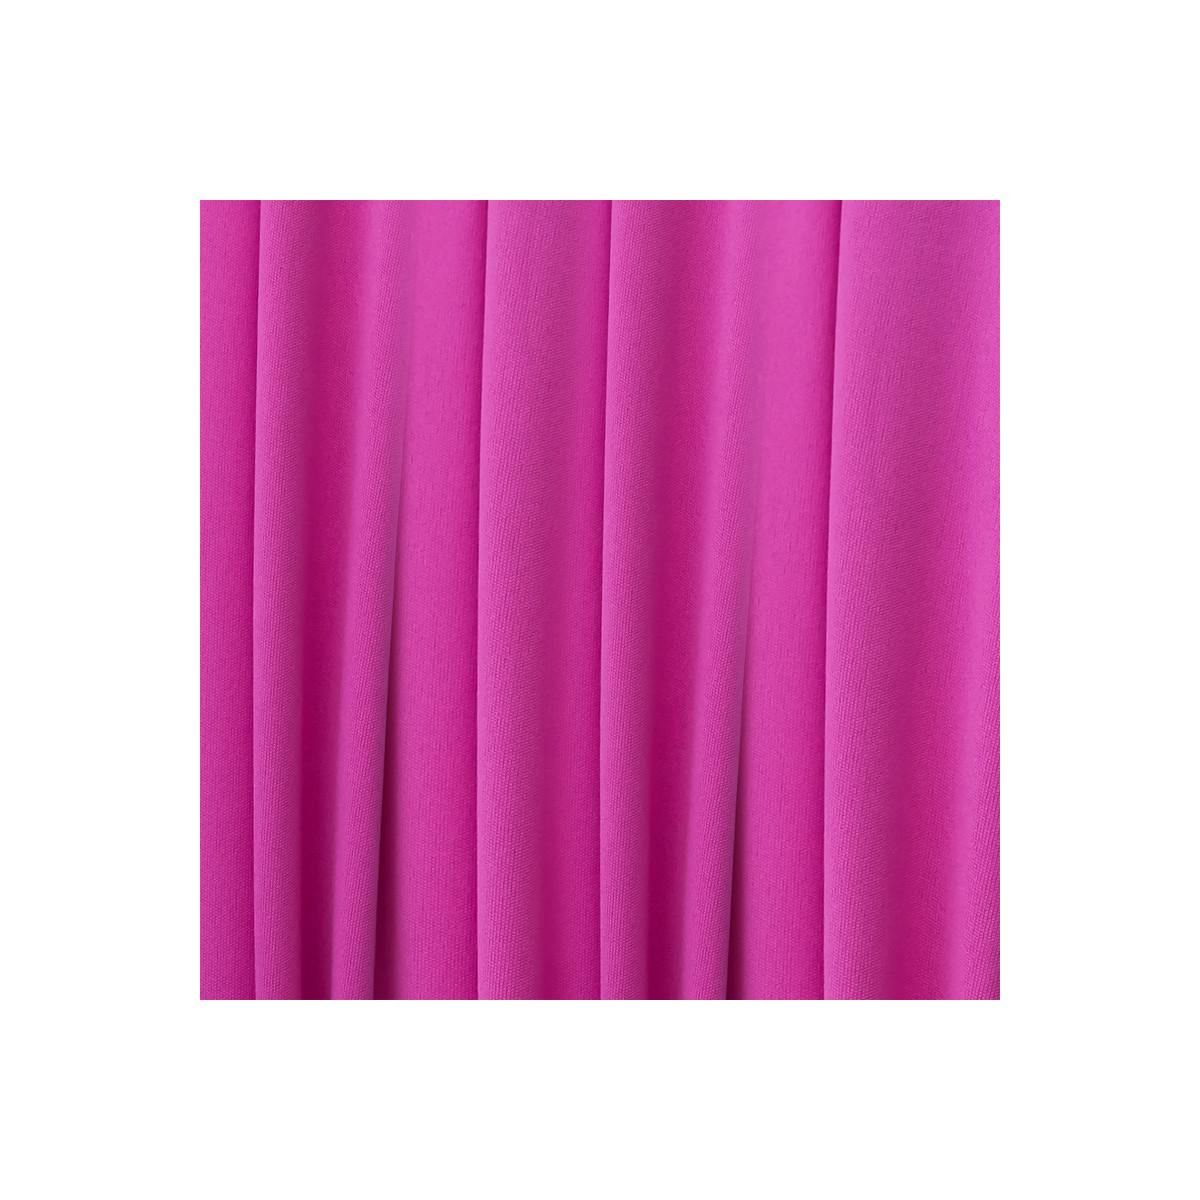 Aerial Silk -  Luftgewebe Soft